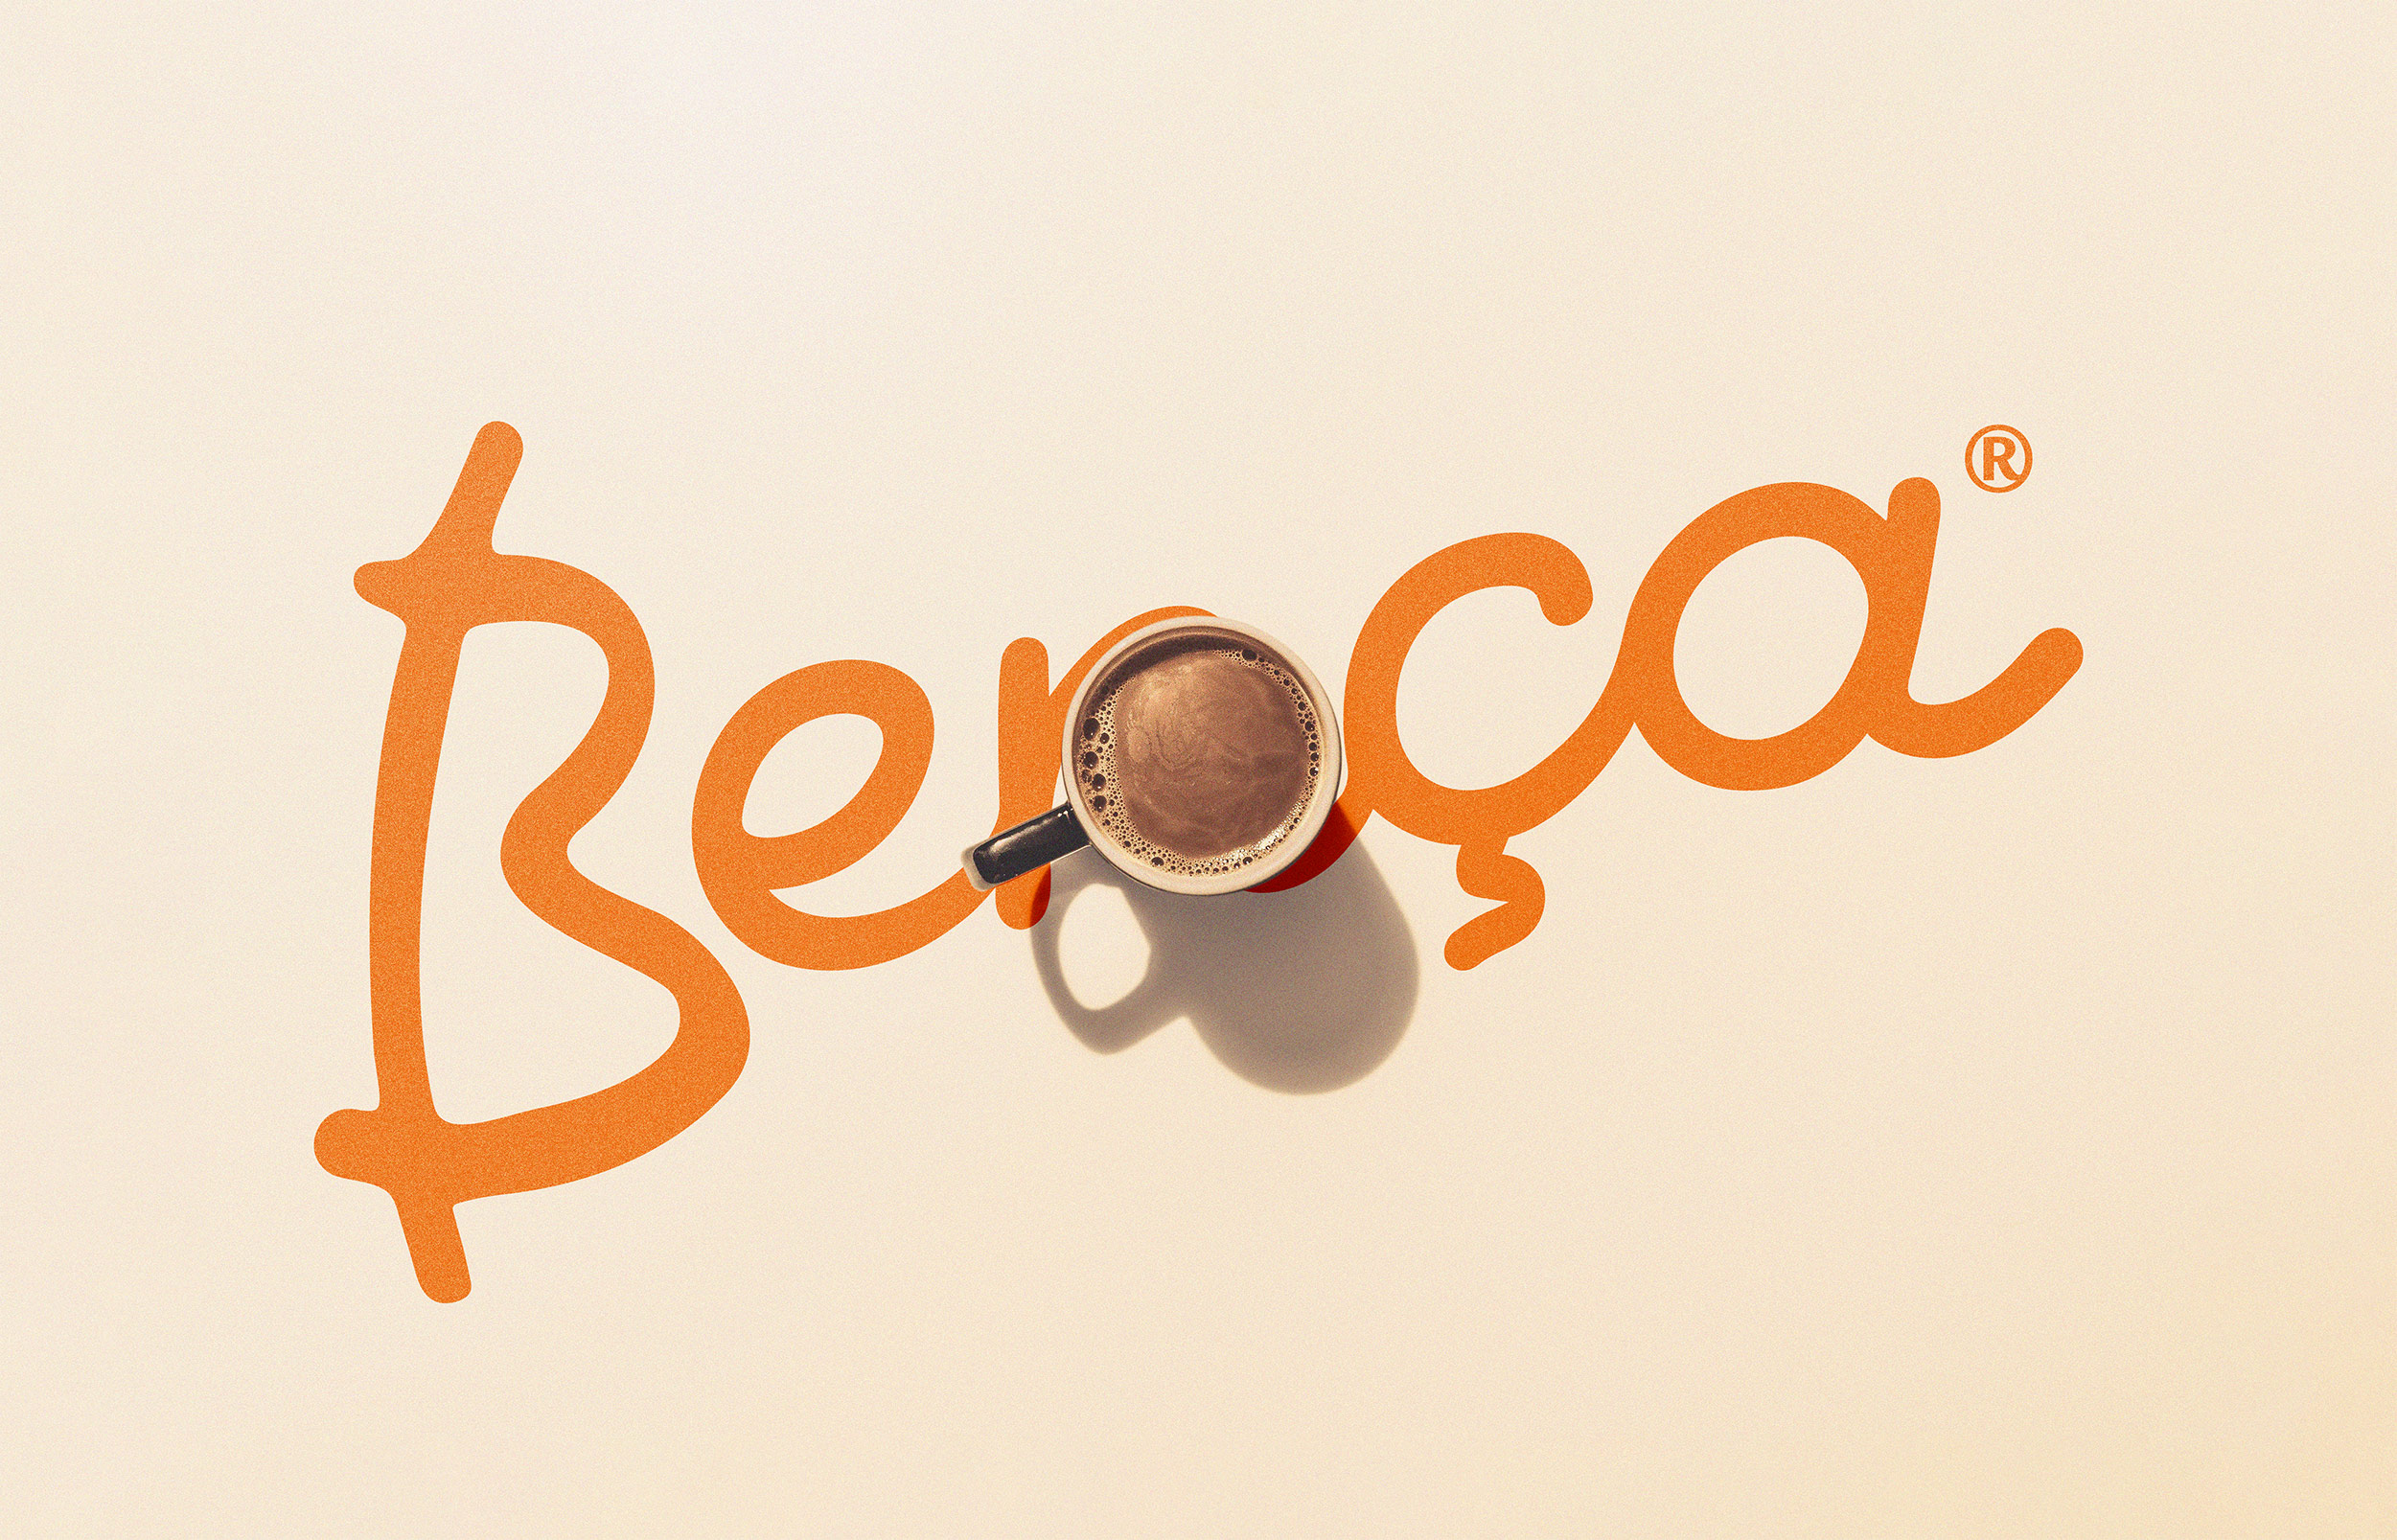 Lucas Iemini Design Studio Creates Identity for Family Themed Specialty Coffee Brand